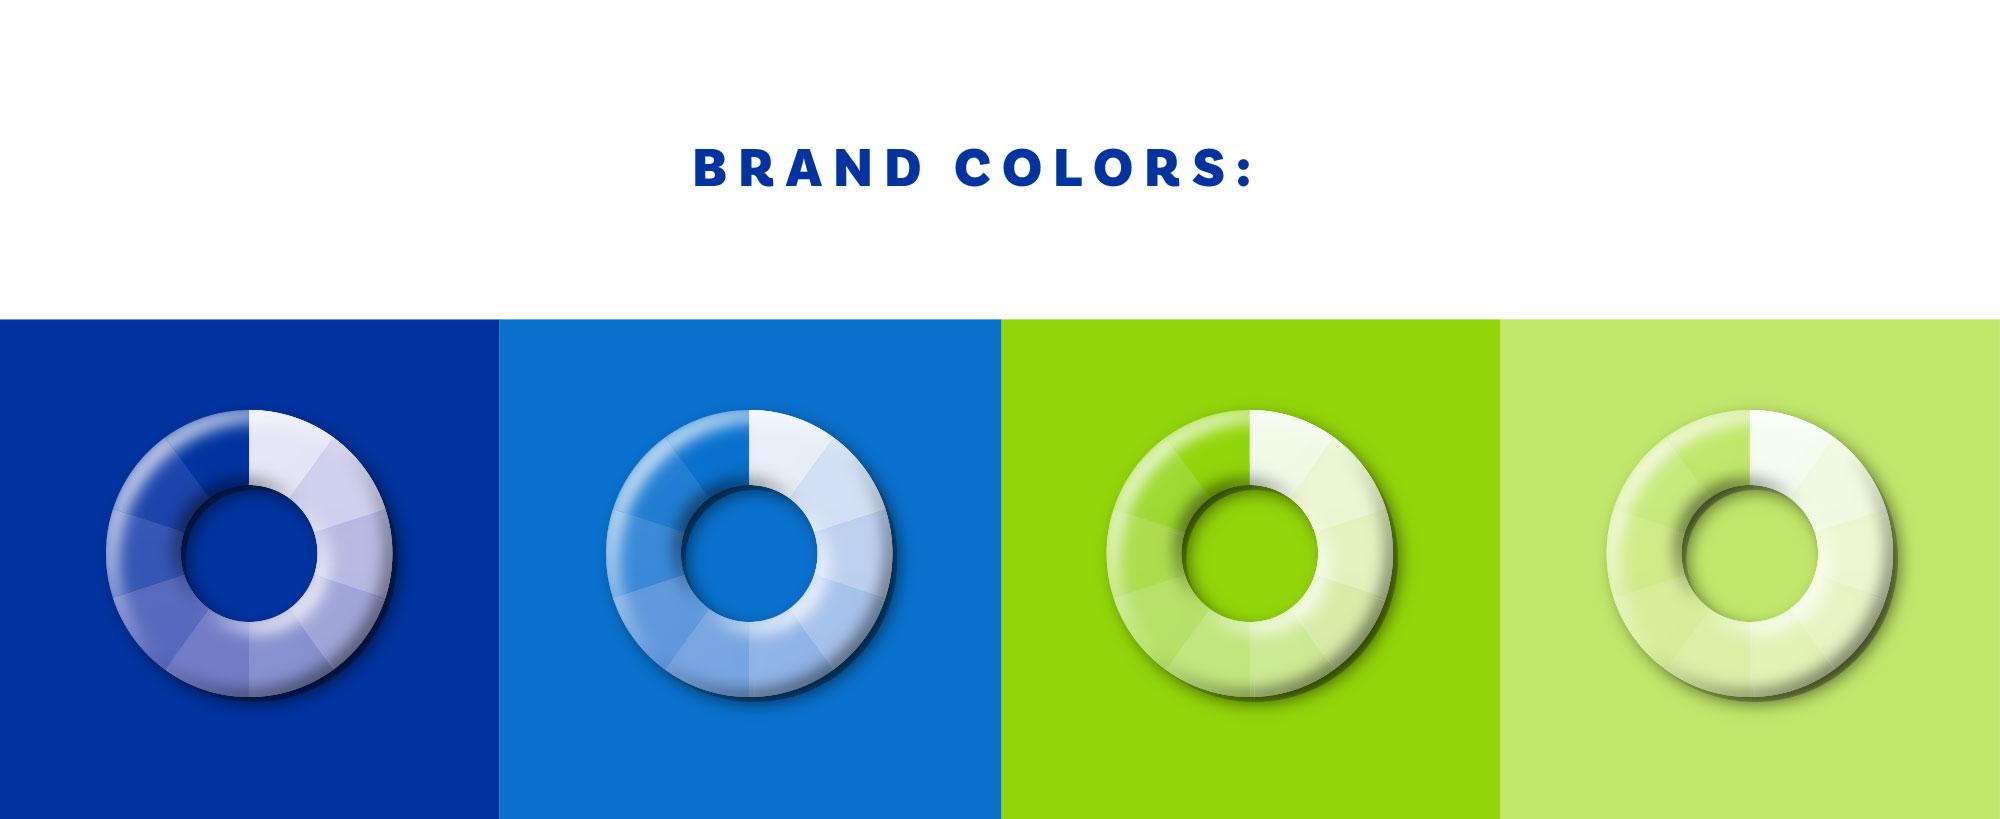 arsenal-brand-color-palette